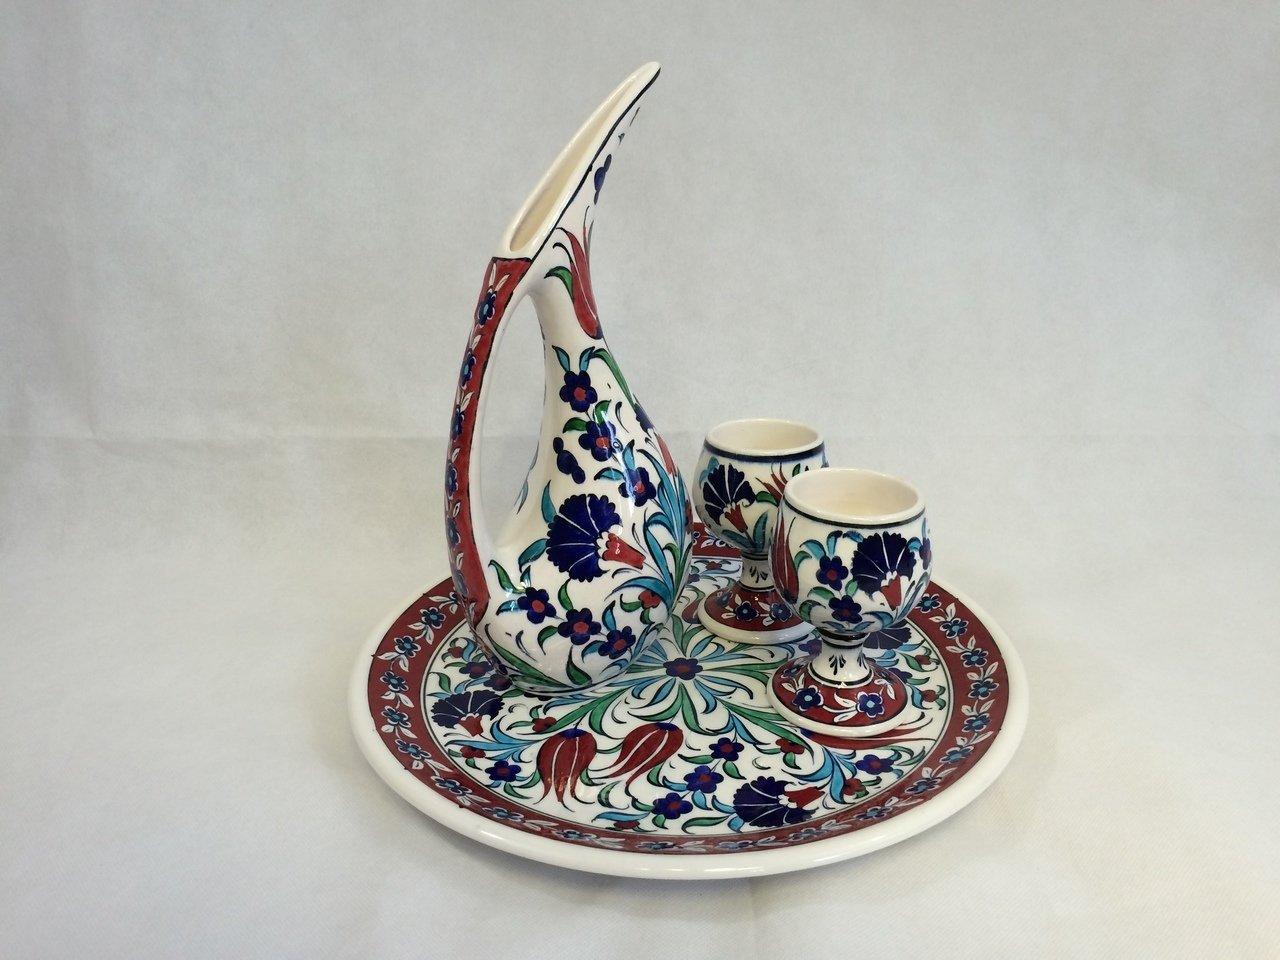 Handmade Ceramic Pelican Coffee/Tea/Wine Jug/Decanter Set: Pelican Jug 11.5''/29 cm; Plate 13''/33 cm; 2 Cups